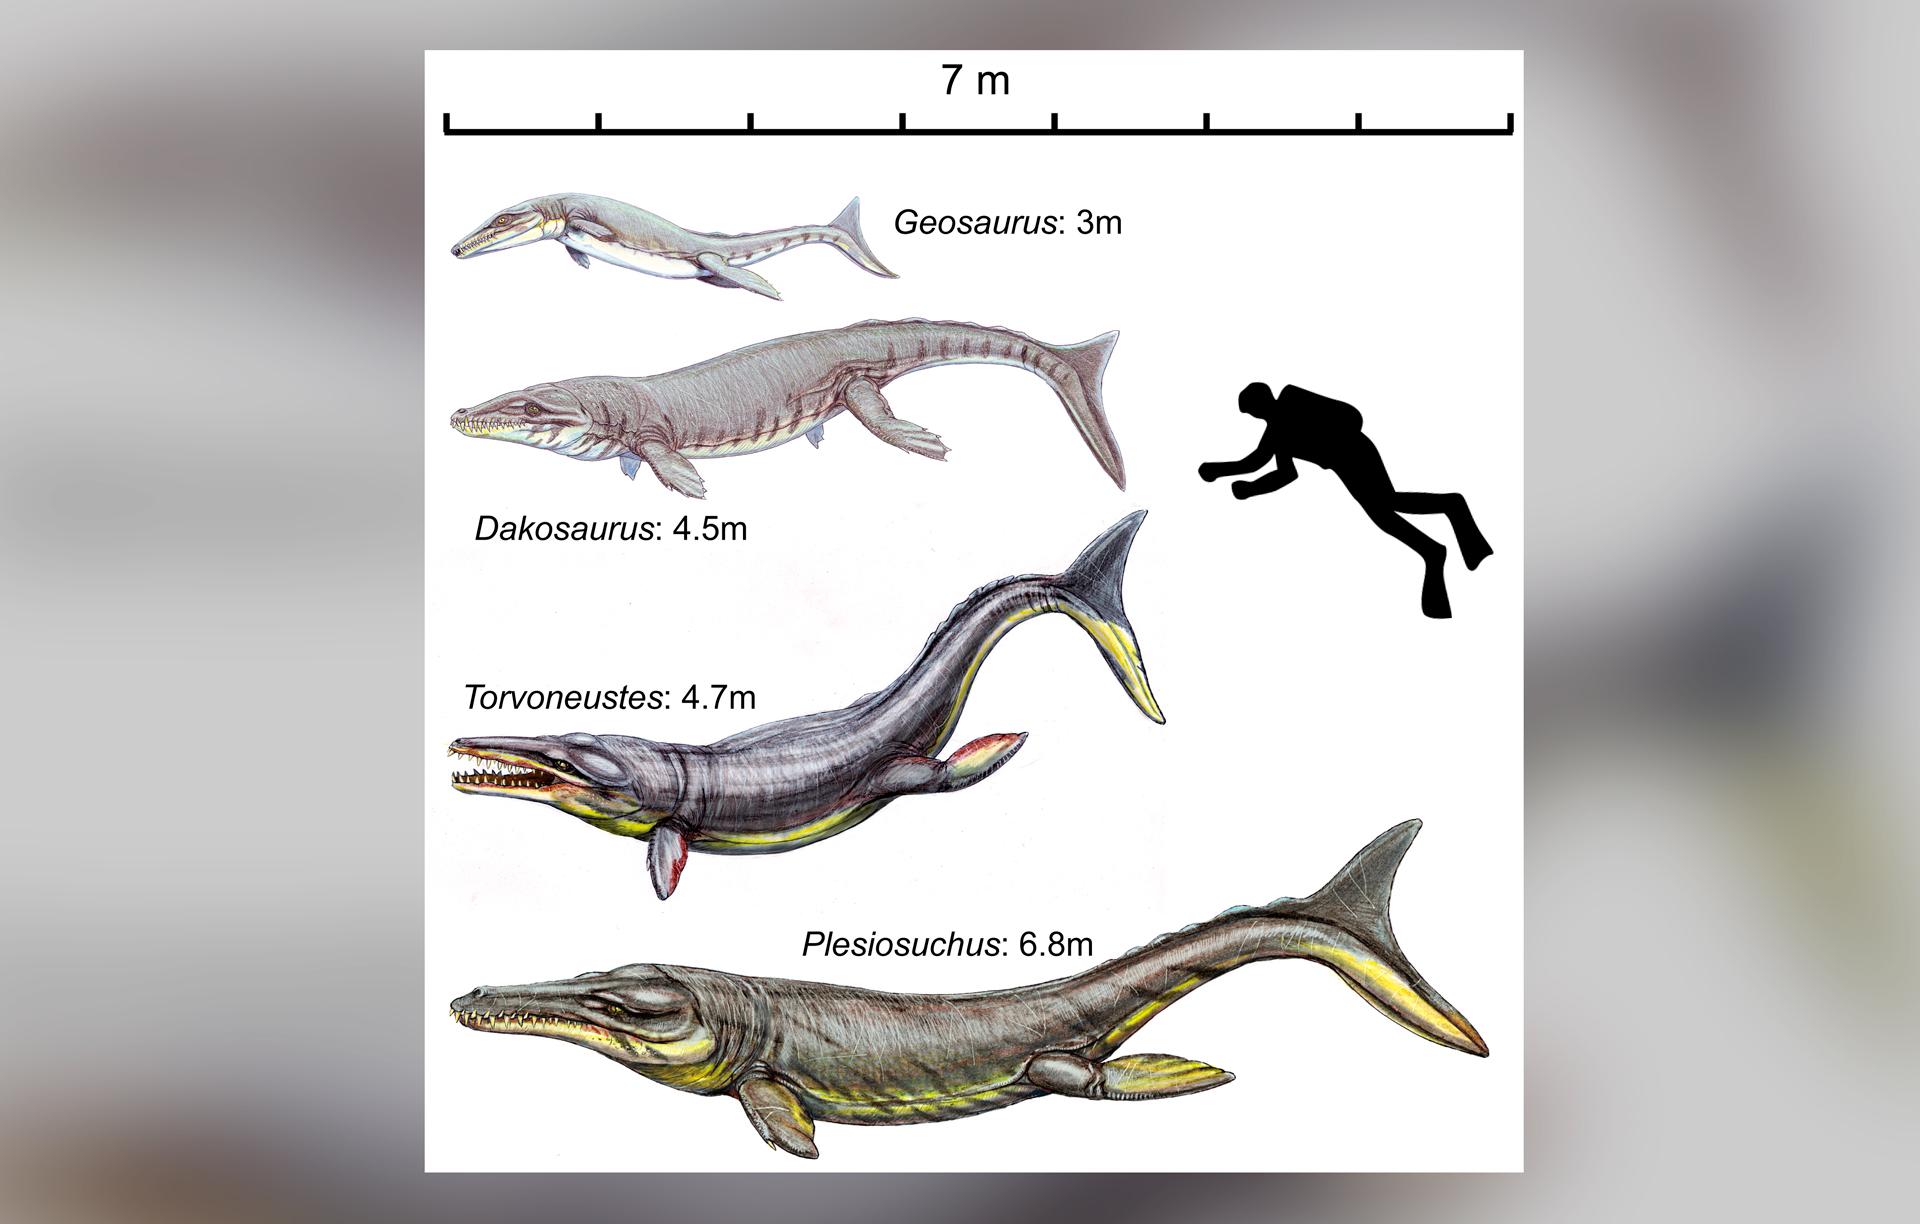 Реконструкция водоплавающих крокодиломорфов — талаттозухий. Фото © Wikipedia